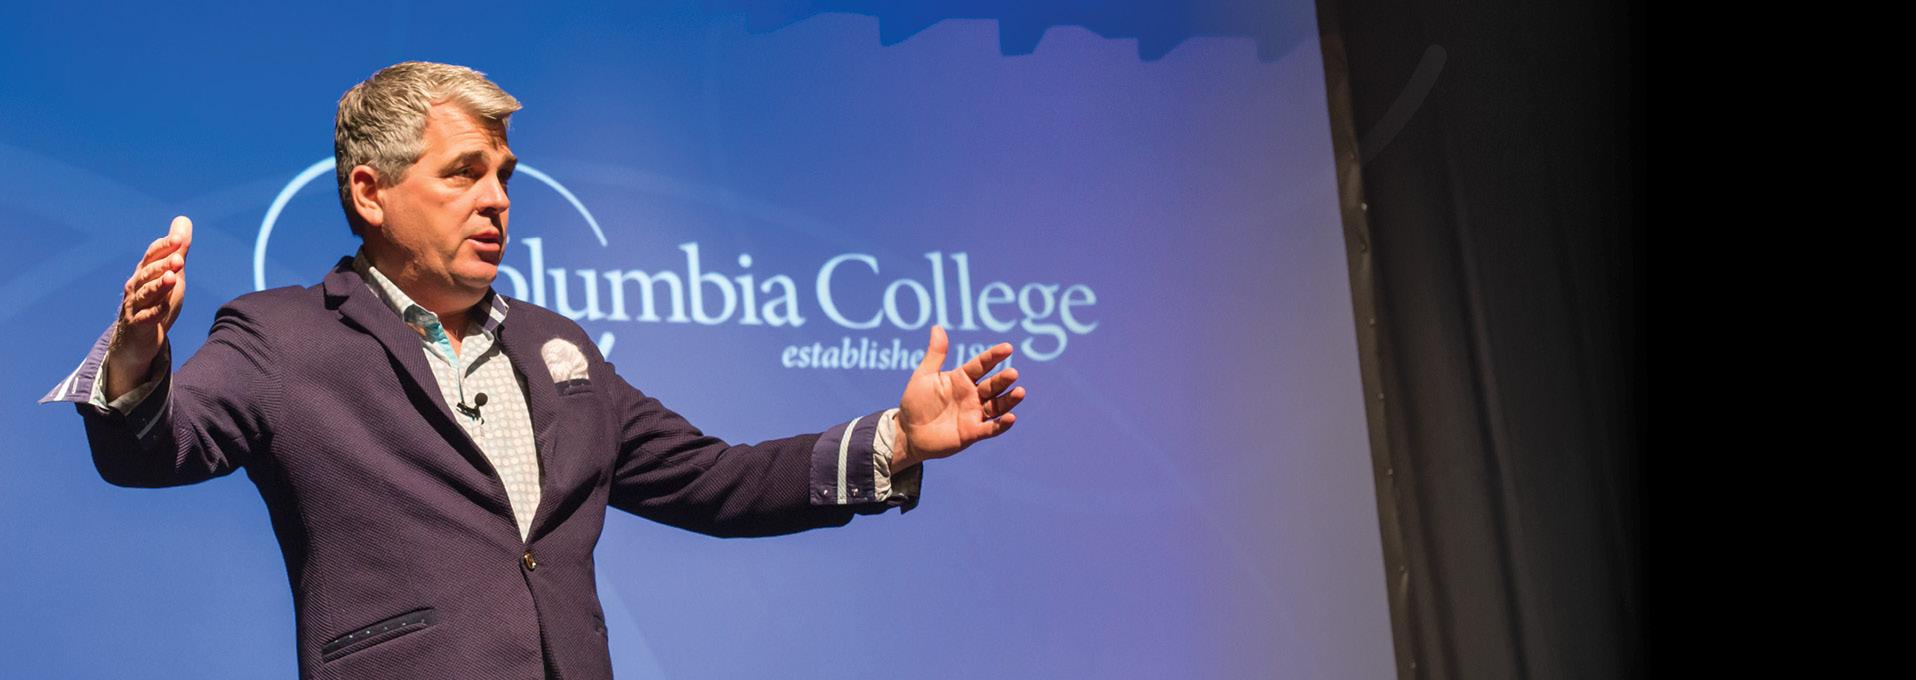 Duane Cummings imparts leadership lessons during visit